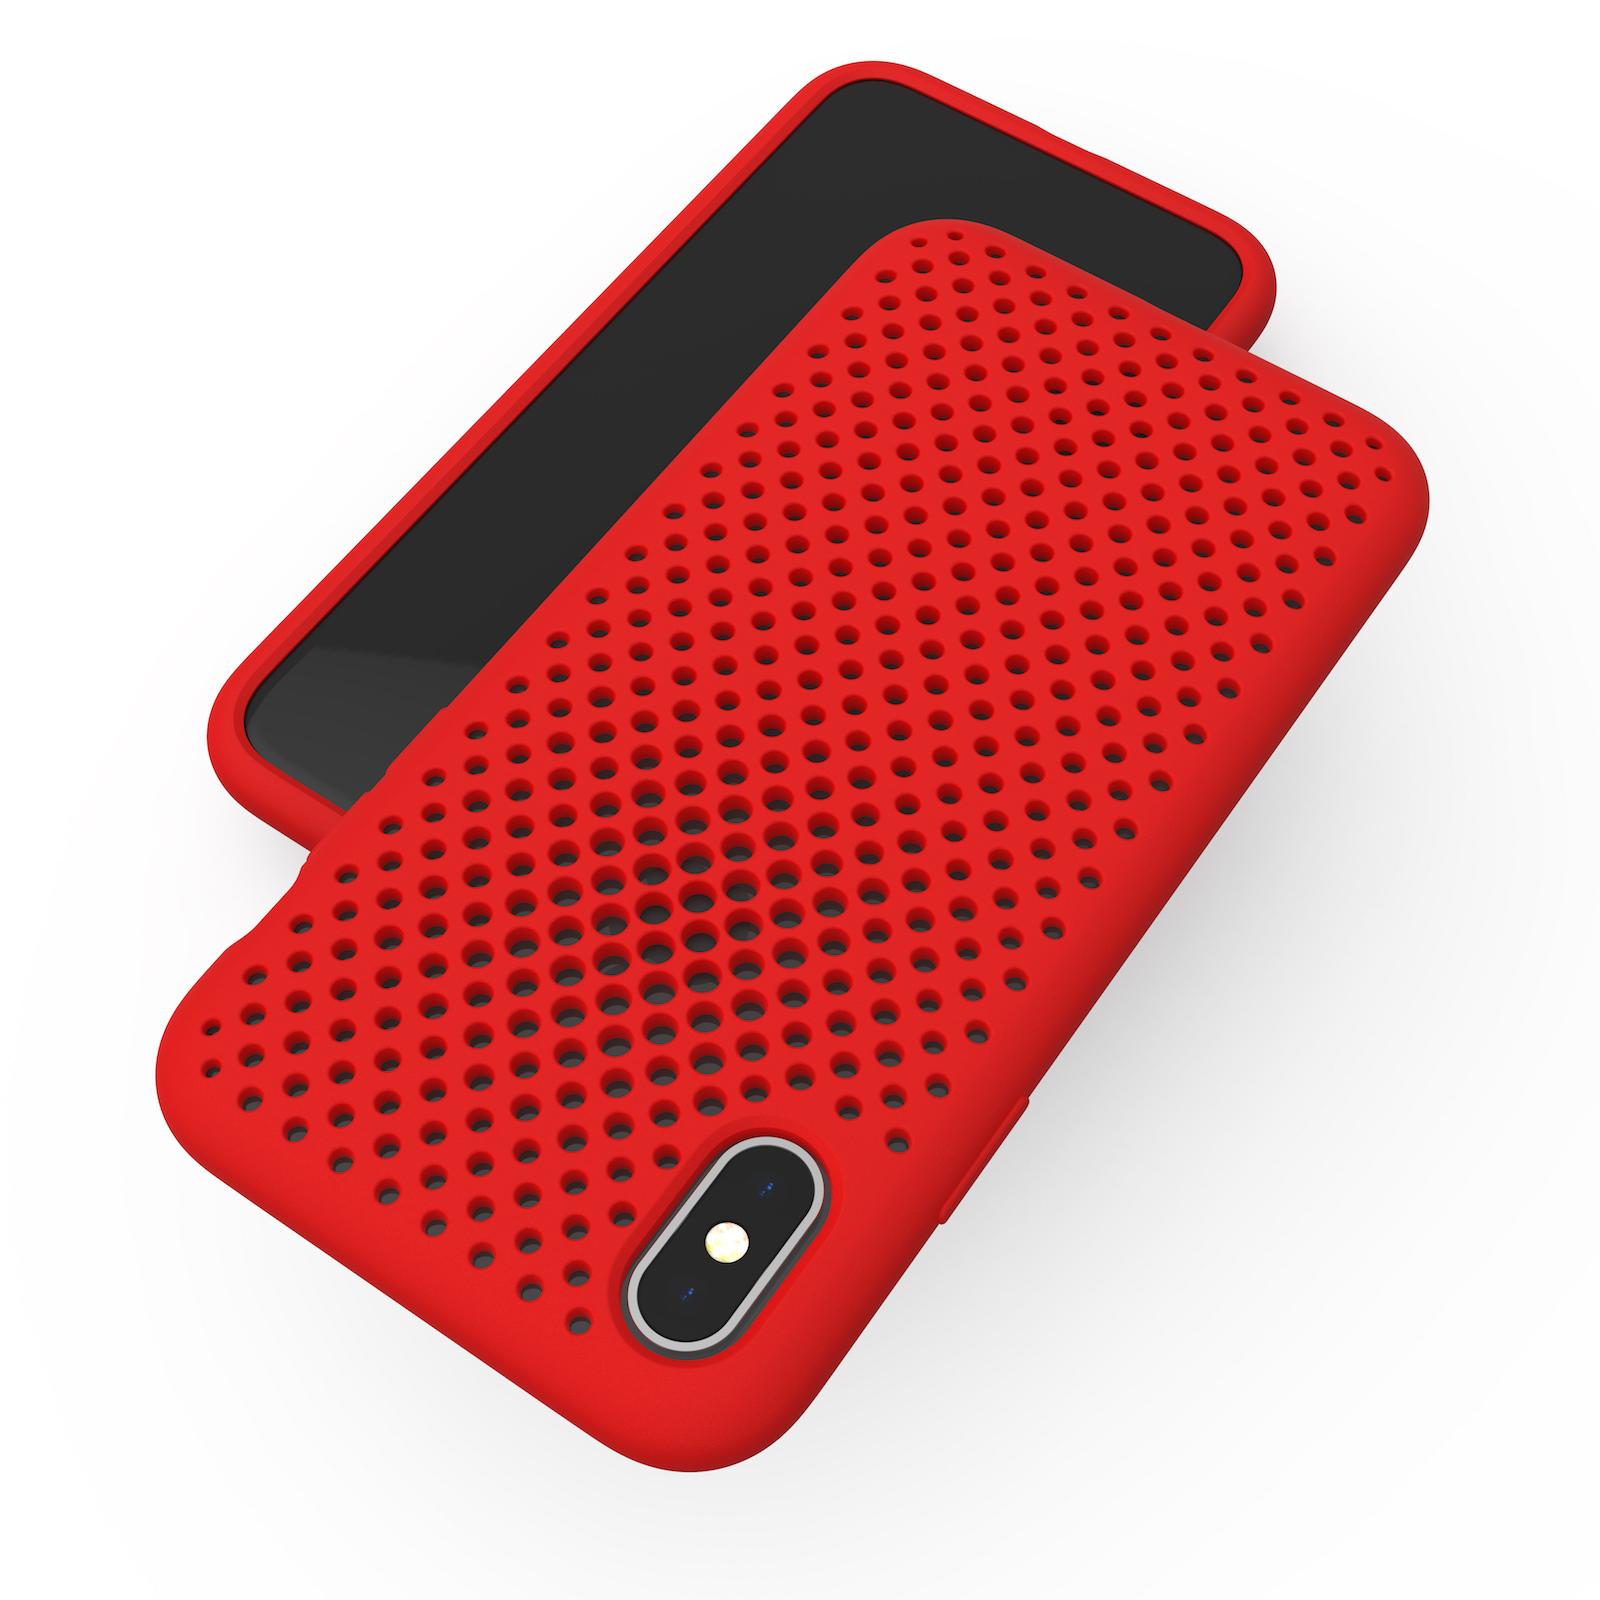 20171115 MeshCase iPhoneX 01 RED